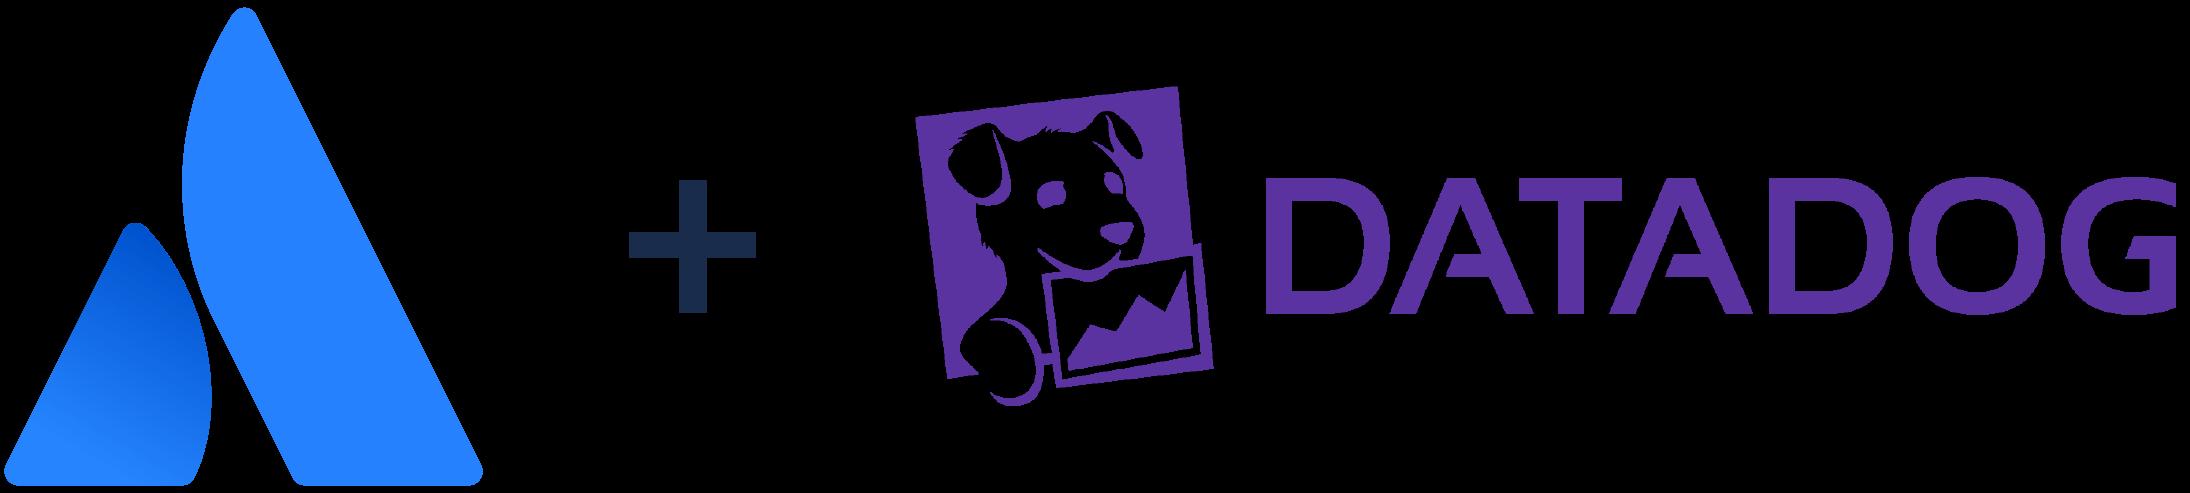 Logo Atlassian + logo Datadog